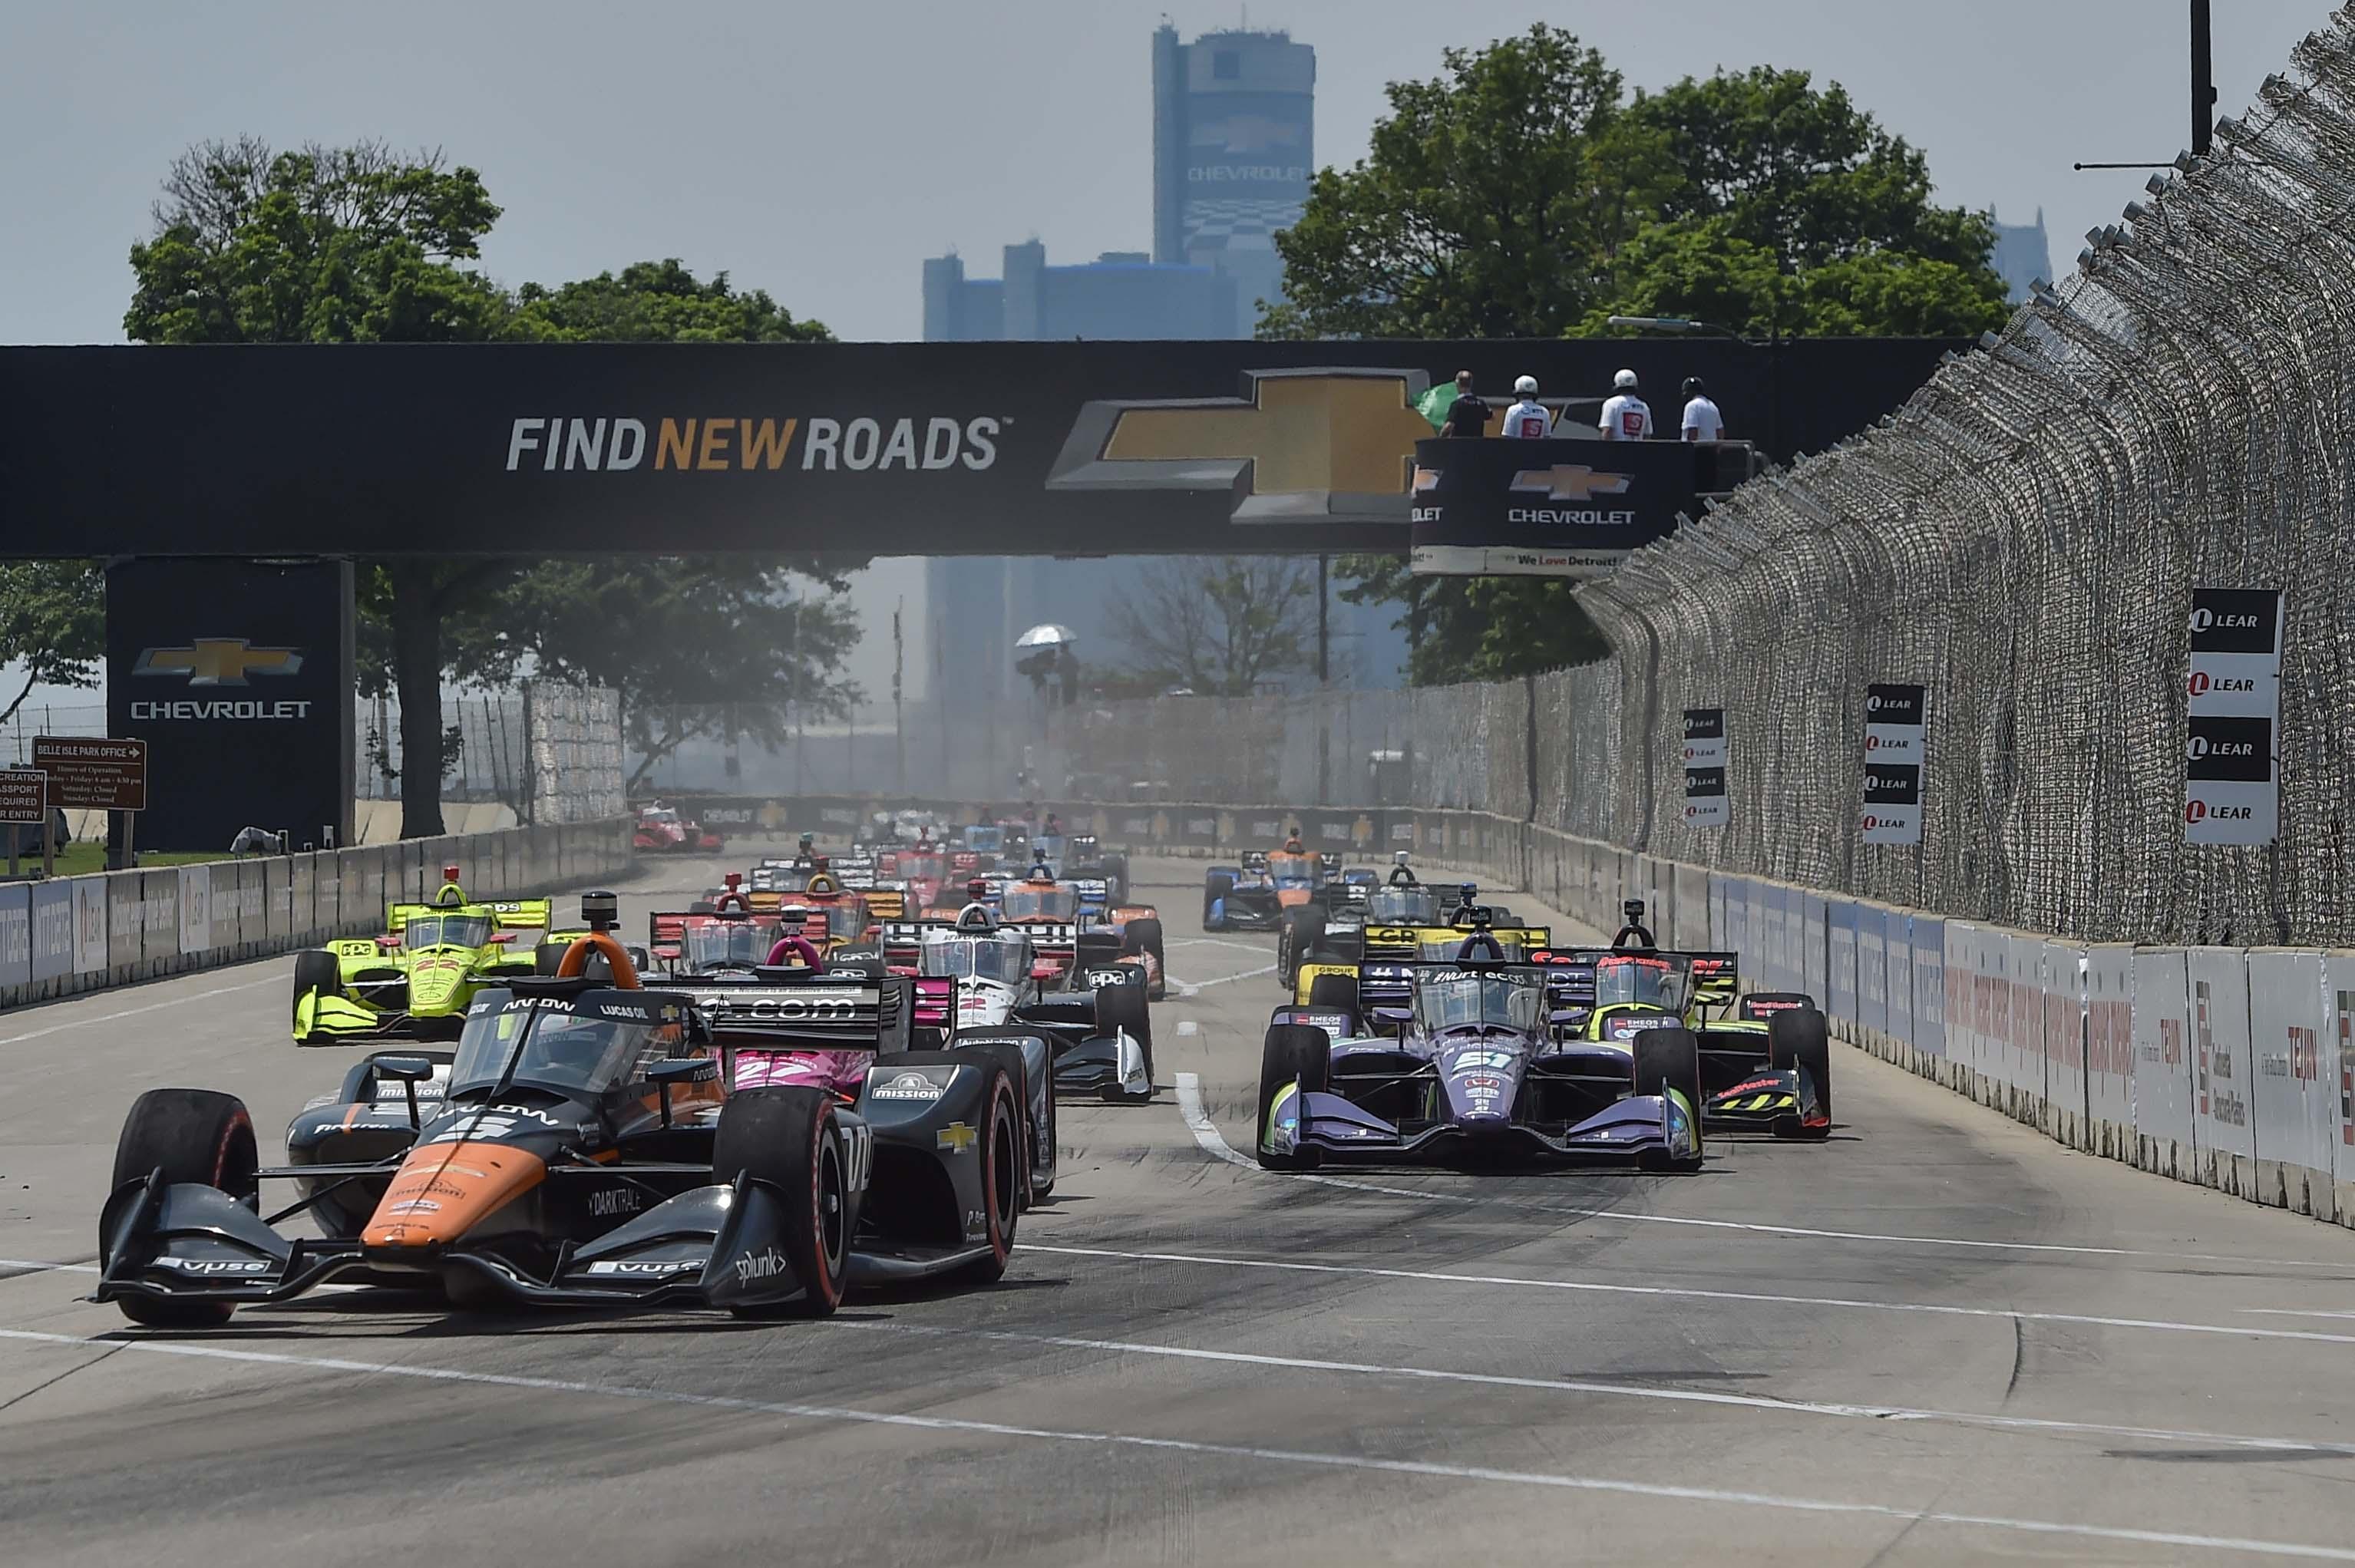 Pato O'Ward - Detroit Grand Prix - Belle Isle Park - Indycar Series